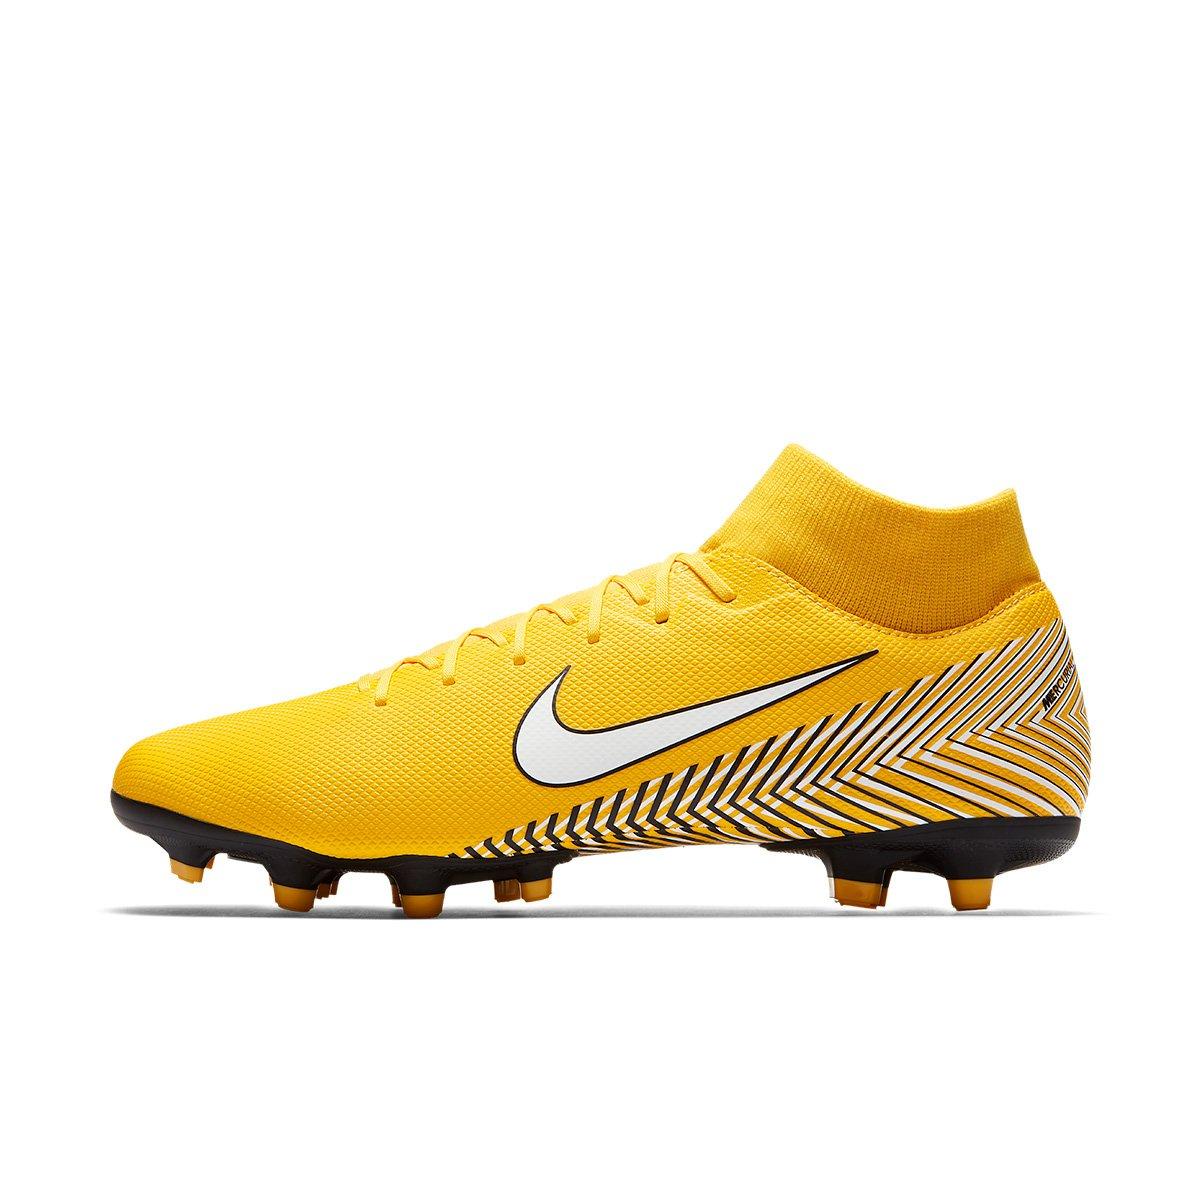 141e0180b8 Chuteira Campo Nike Mercurial Superfly 6 Academy Neymar FG